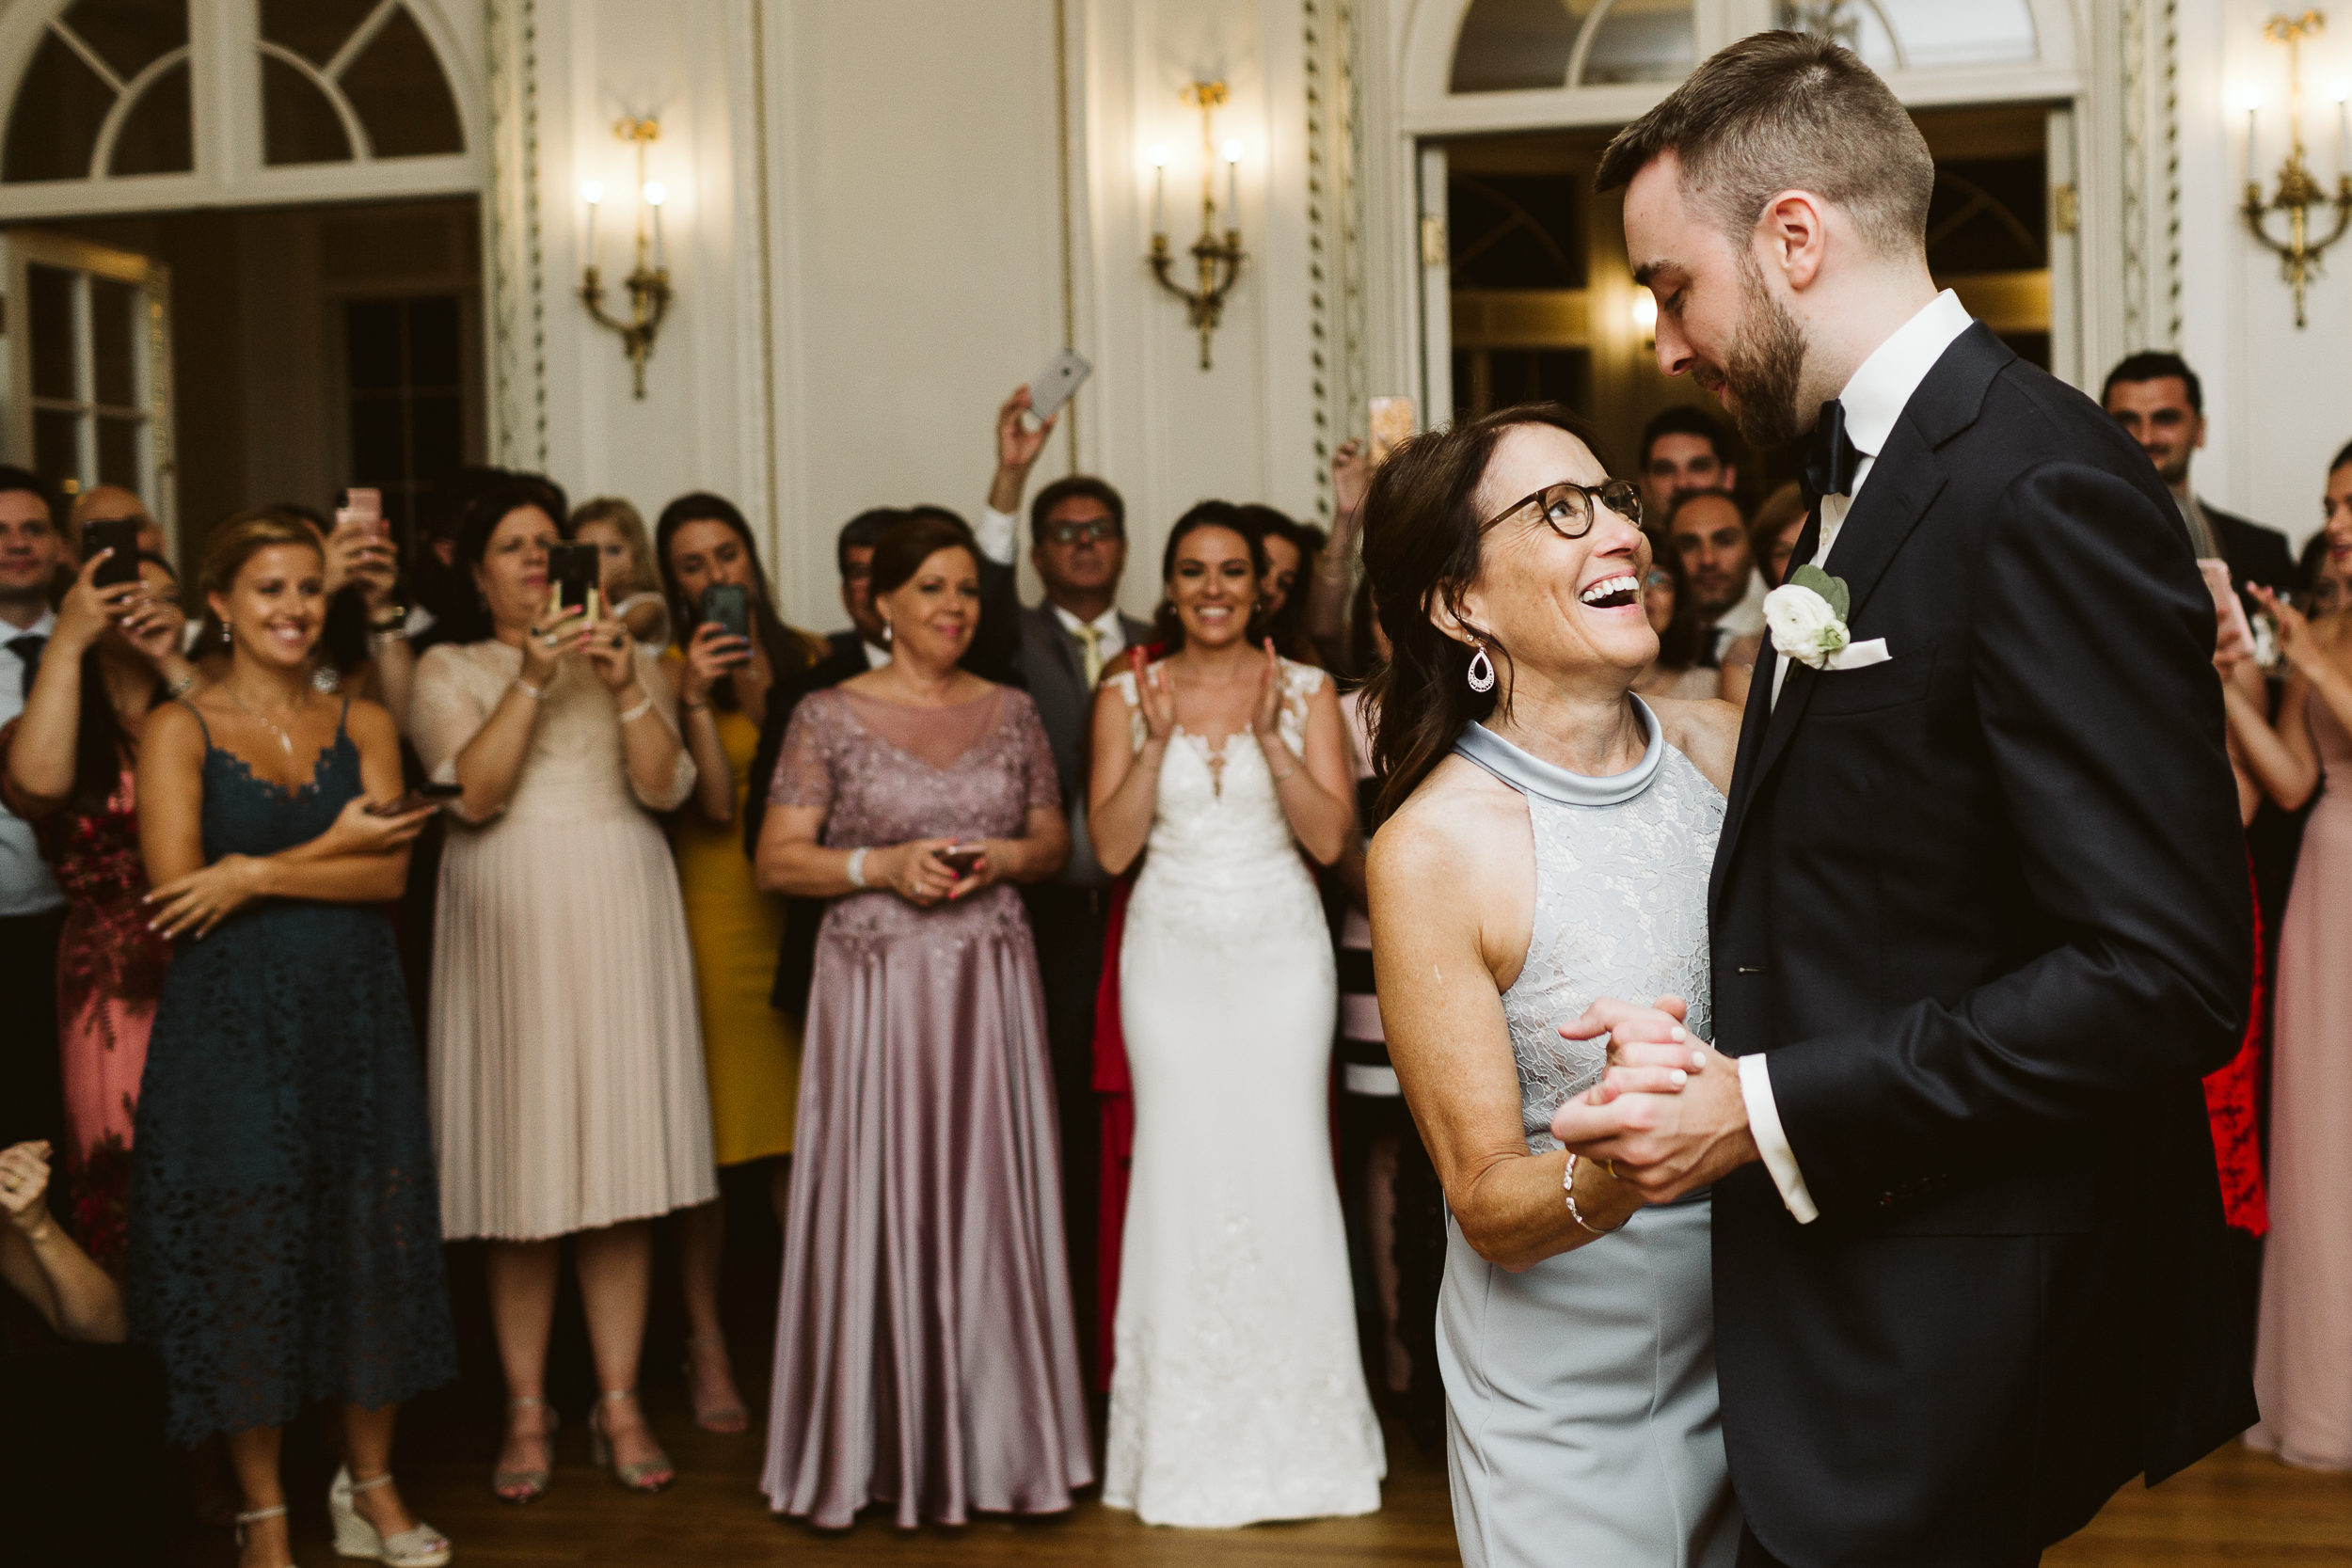 tupper-manor-wedding-photos-0027.JPG